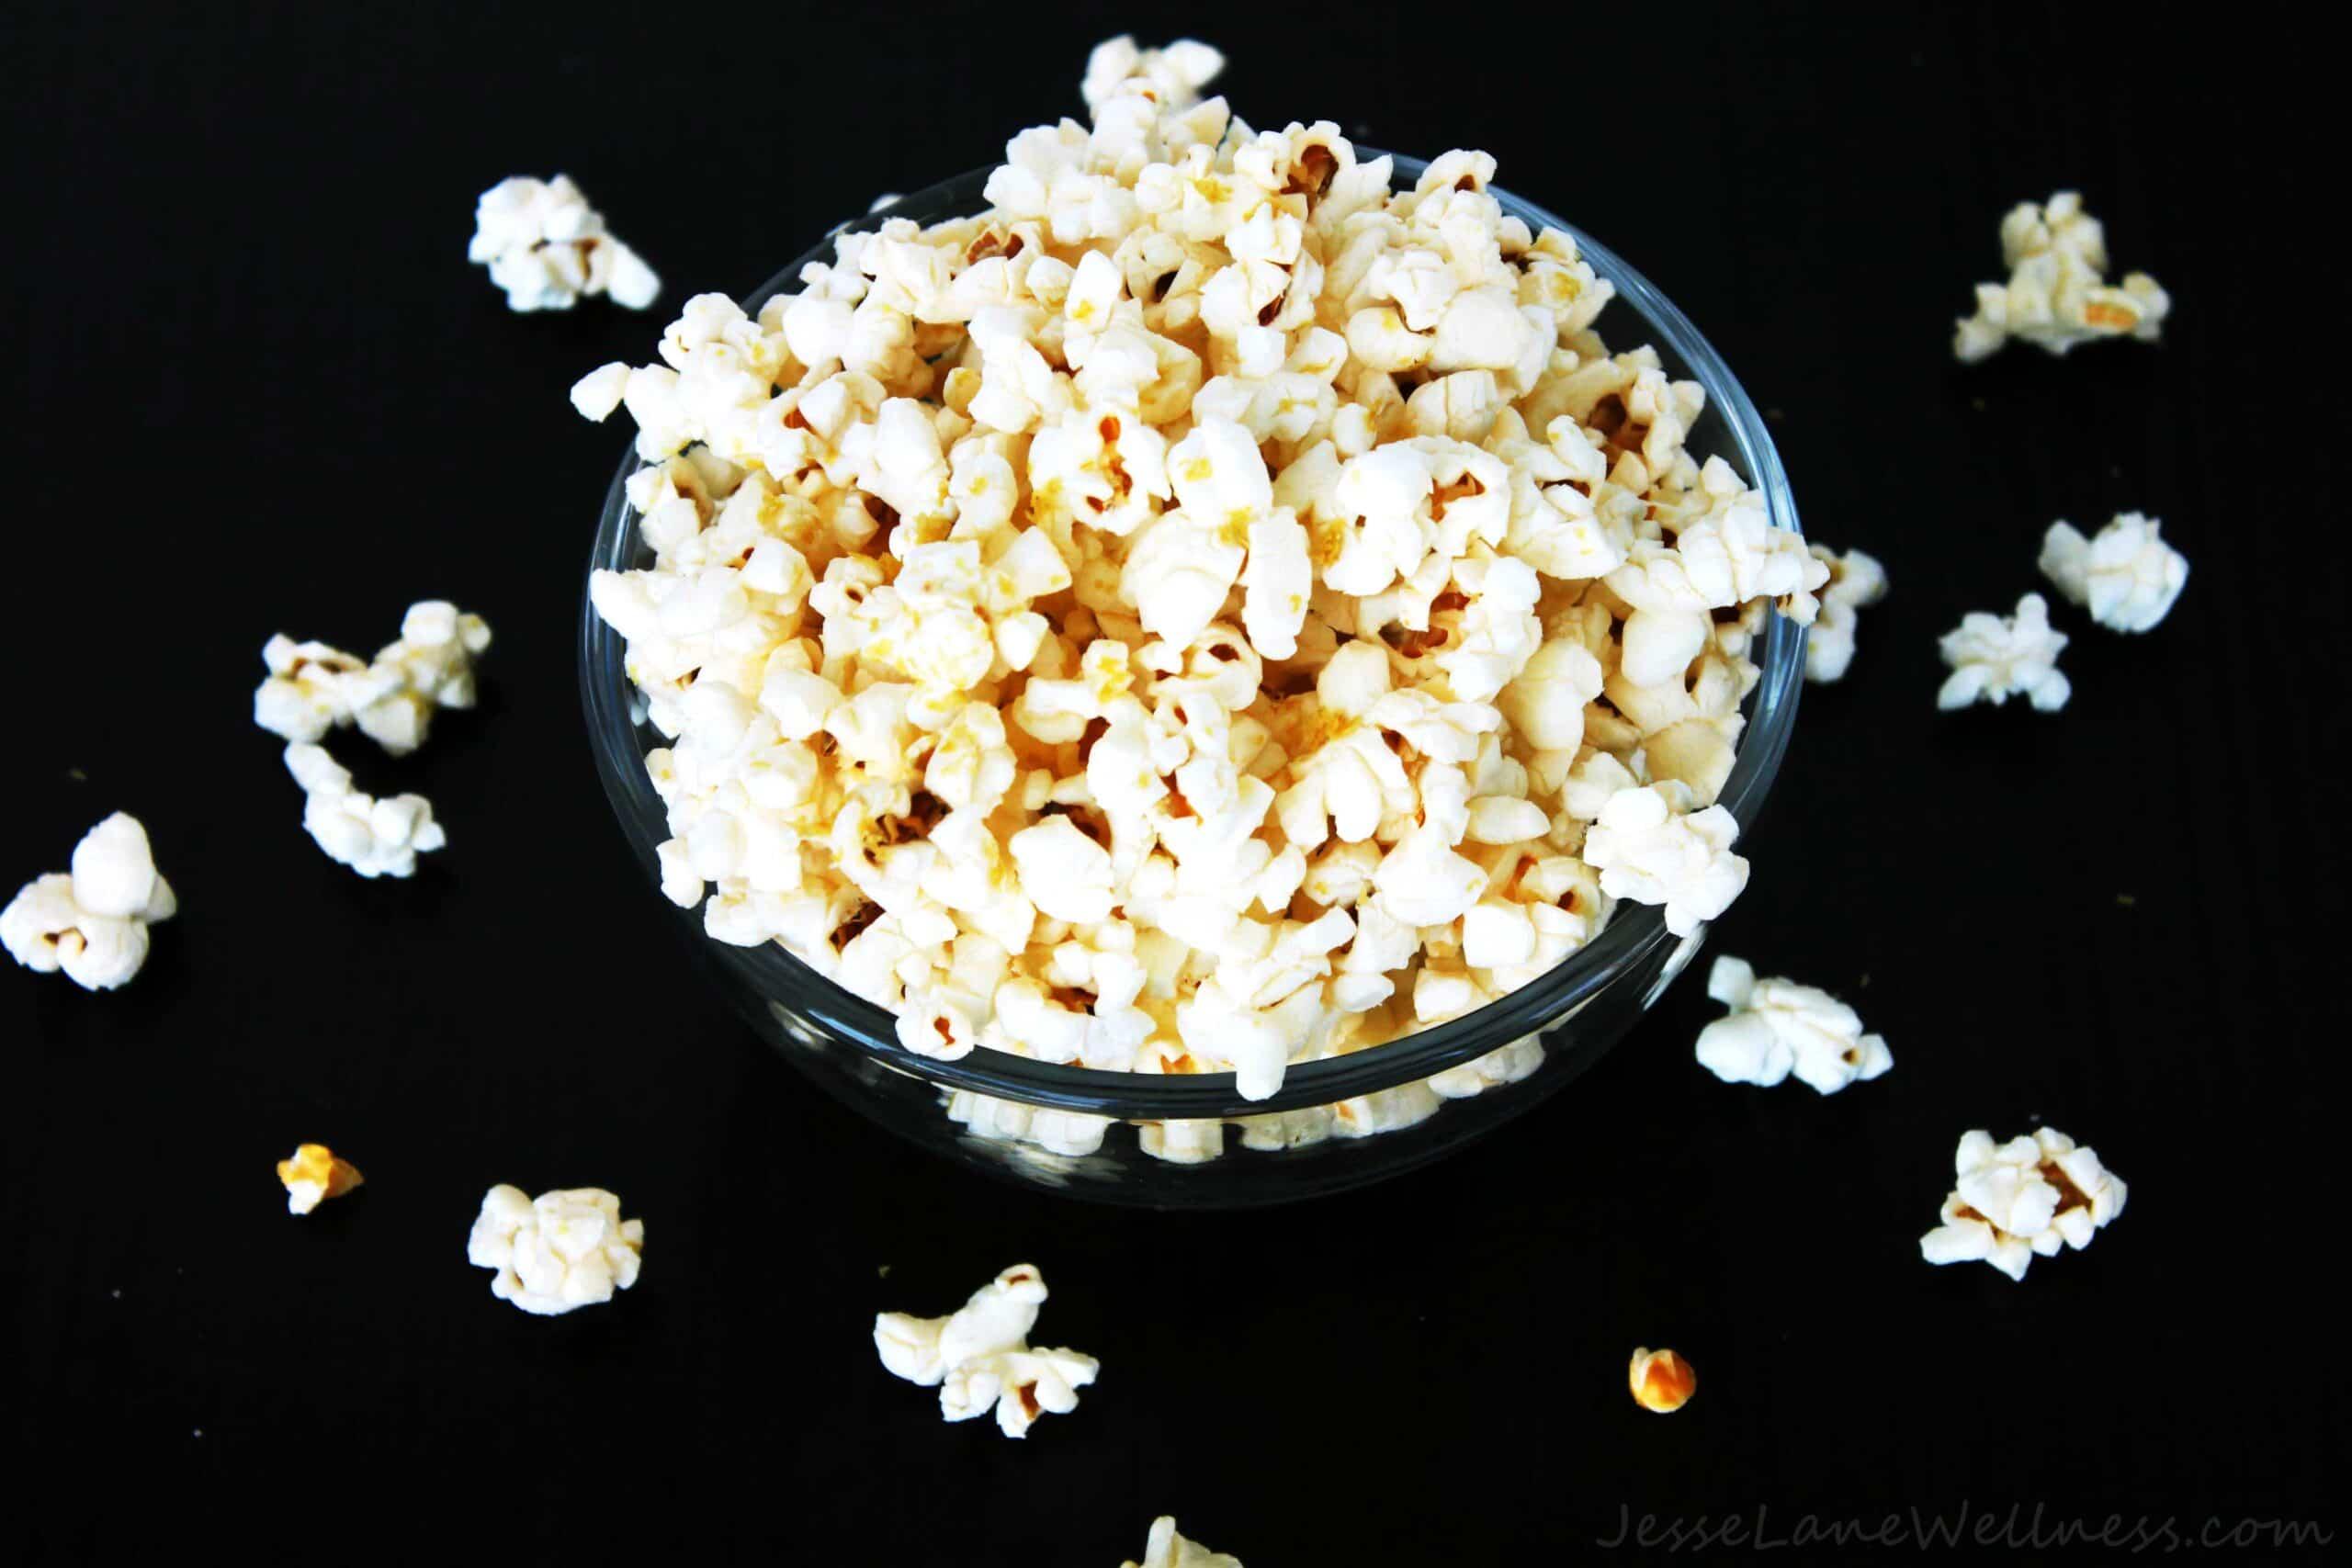 Cheesy Popcorn by @JesseLWellness #cheesy #popcorn